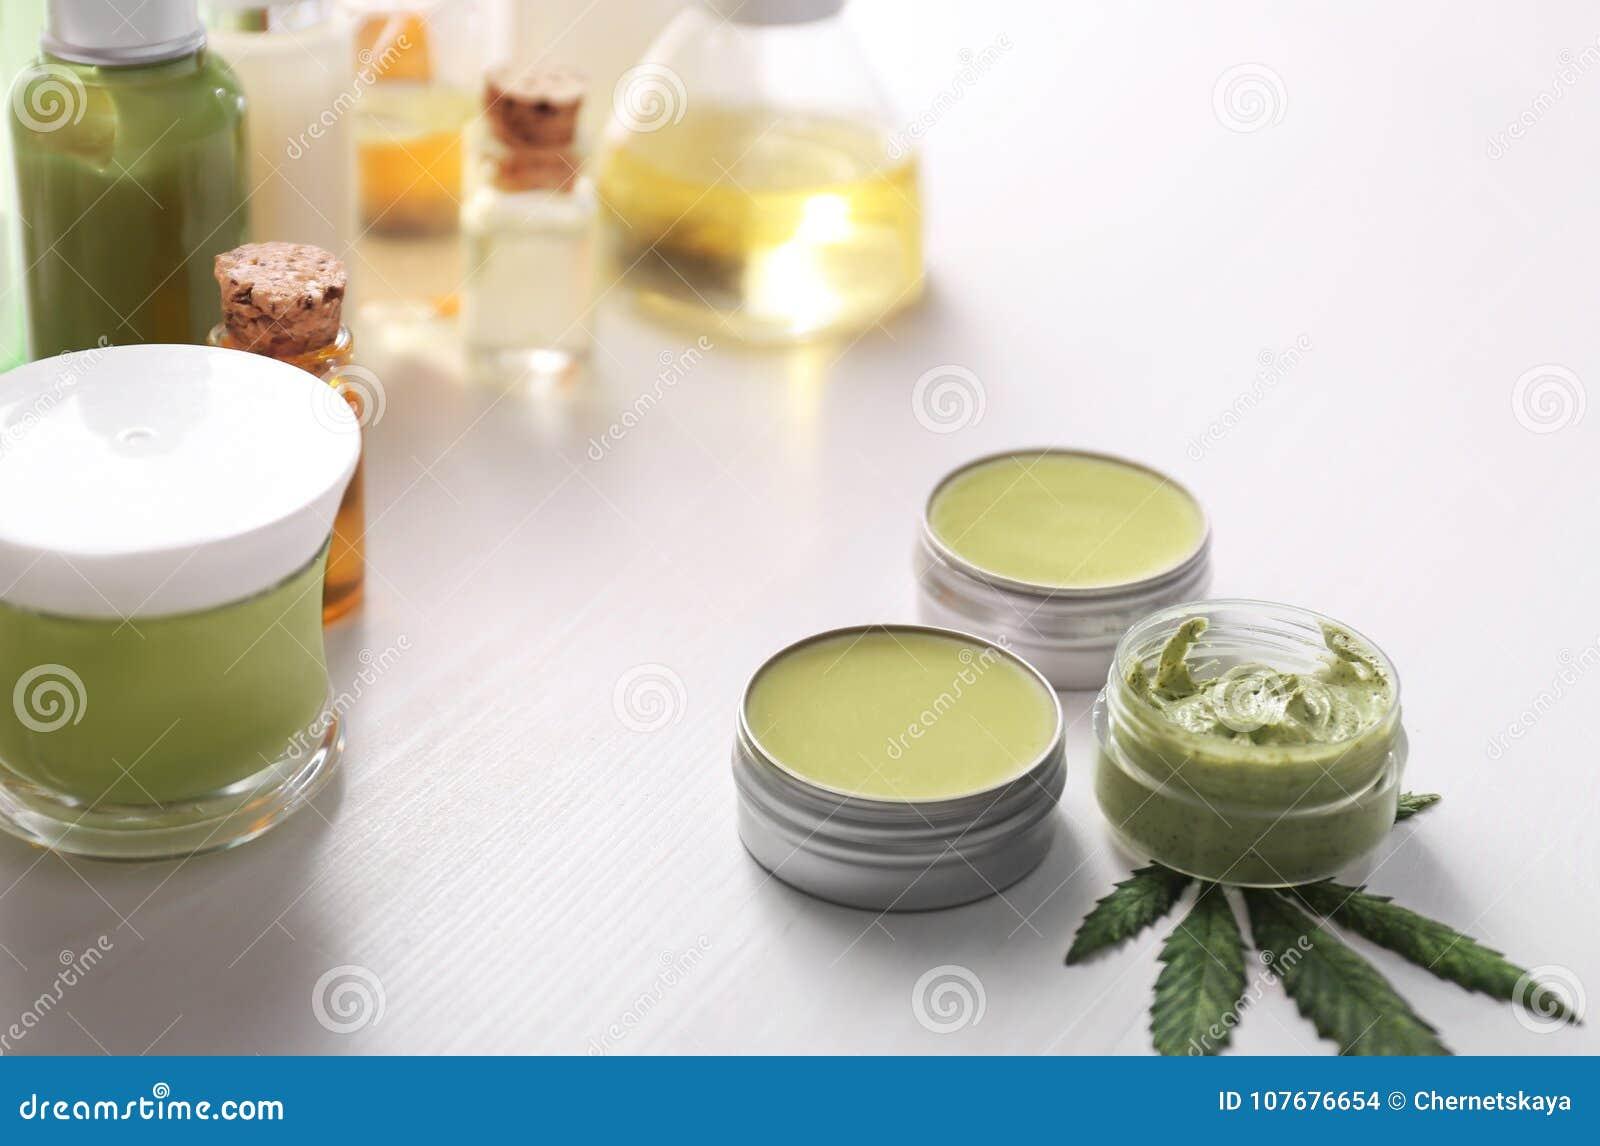 Cosmetics With Hemp Extract Stock Photo - Image of body, leaf: 107676654